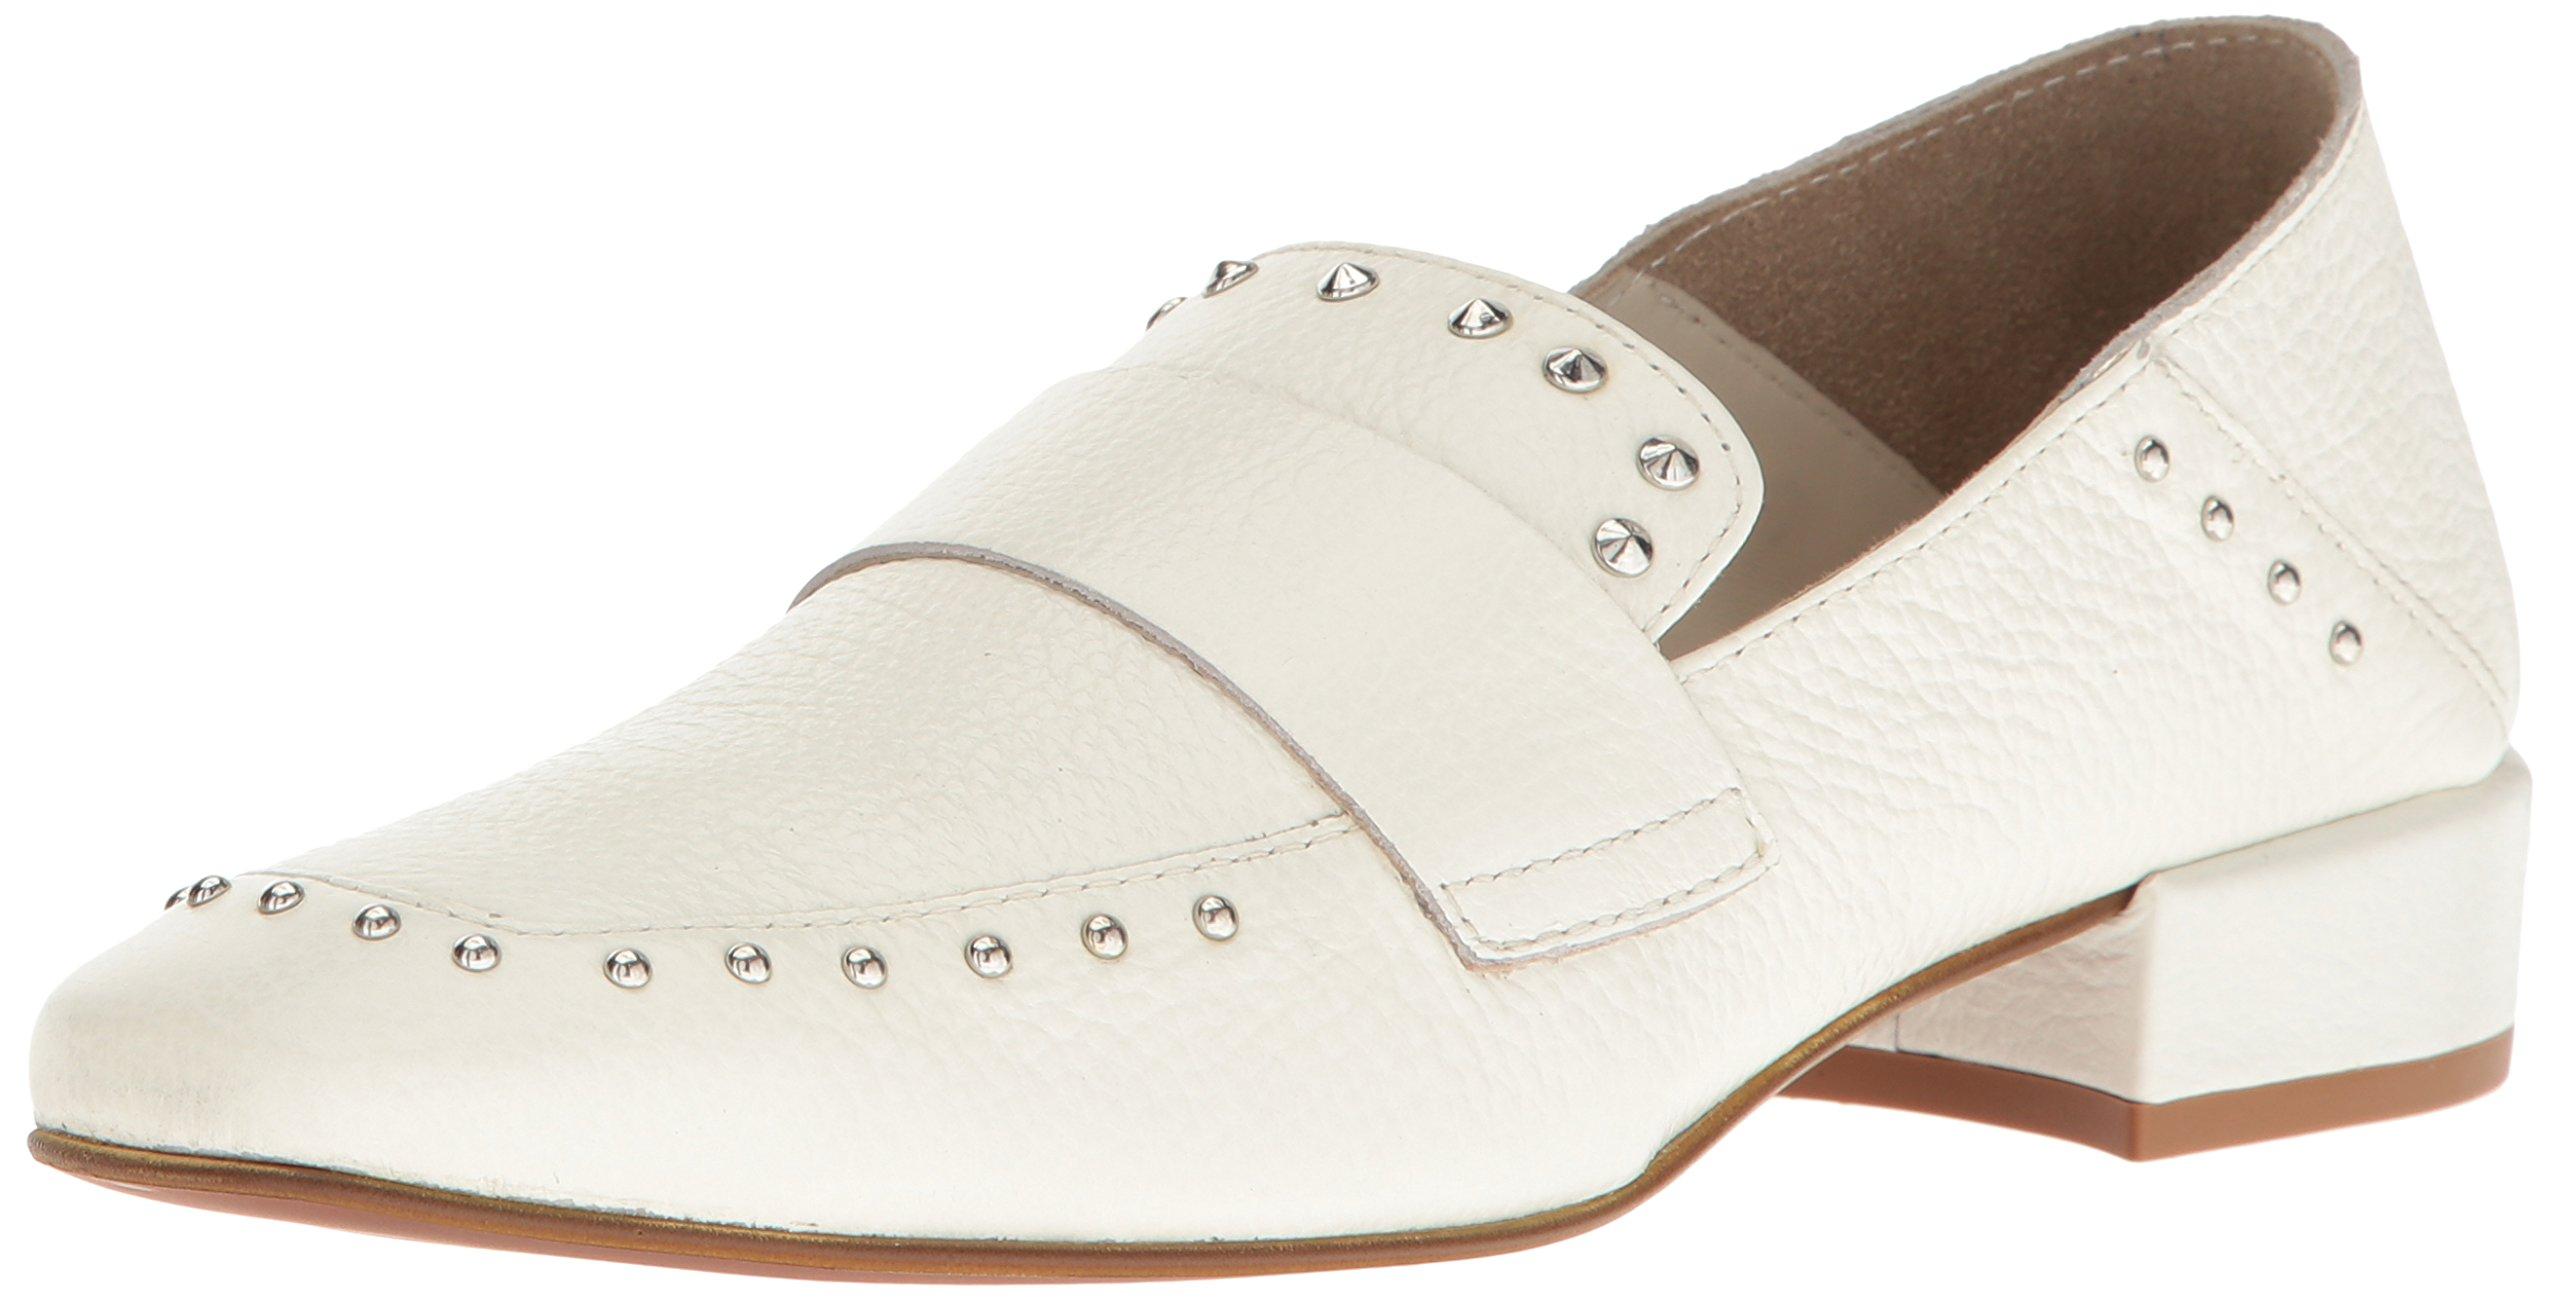 Kenneth Cole New York Women's Bowan 2 Slip-on Loafer, White, 7 M US